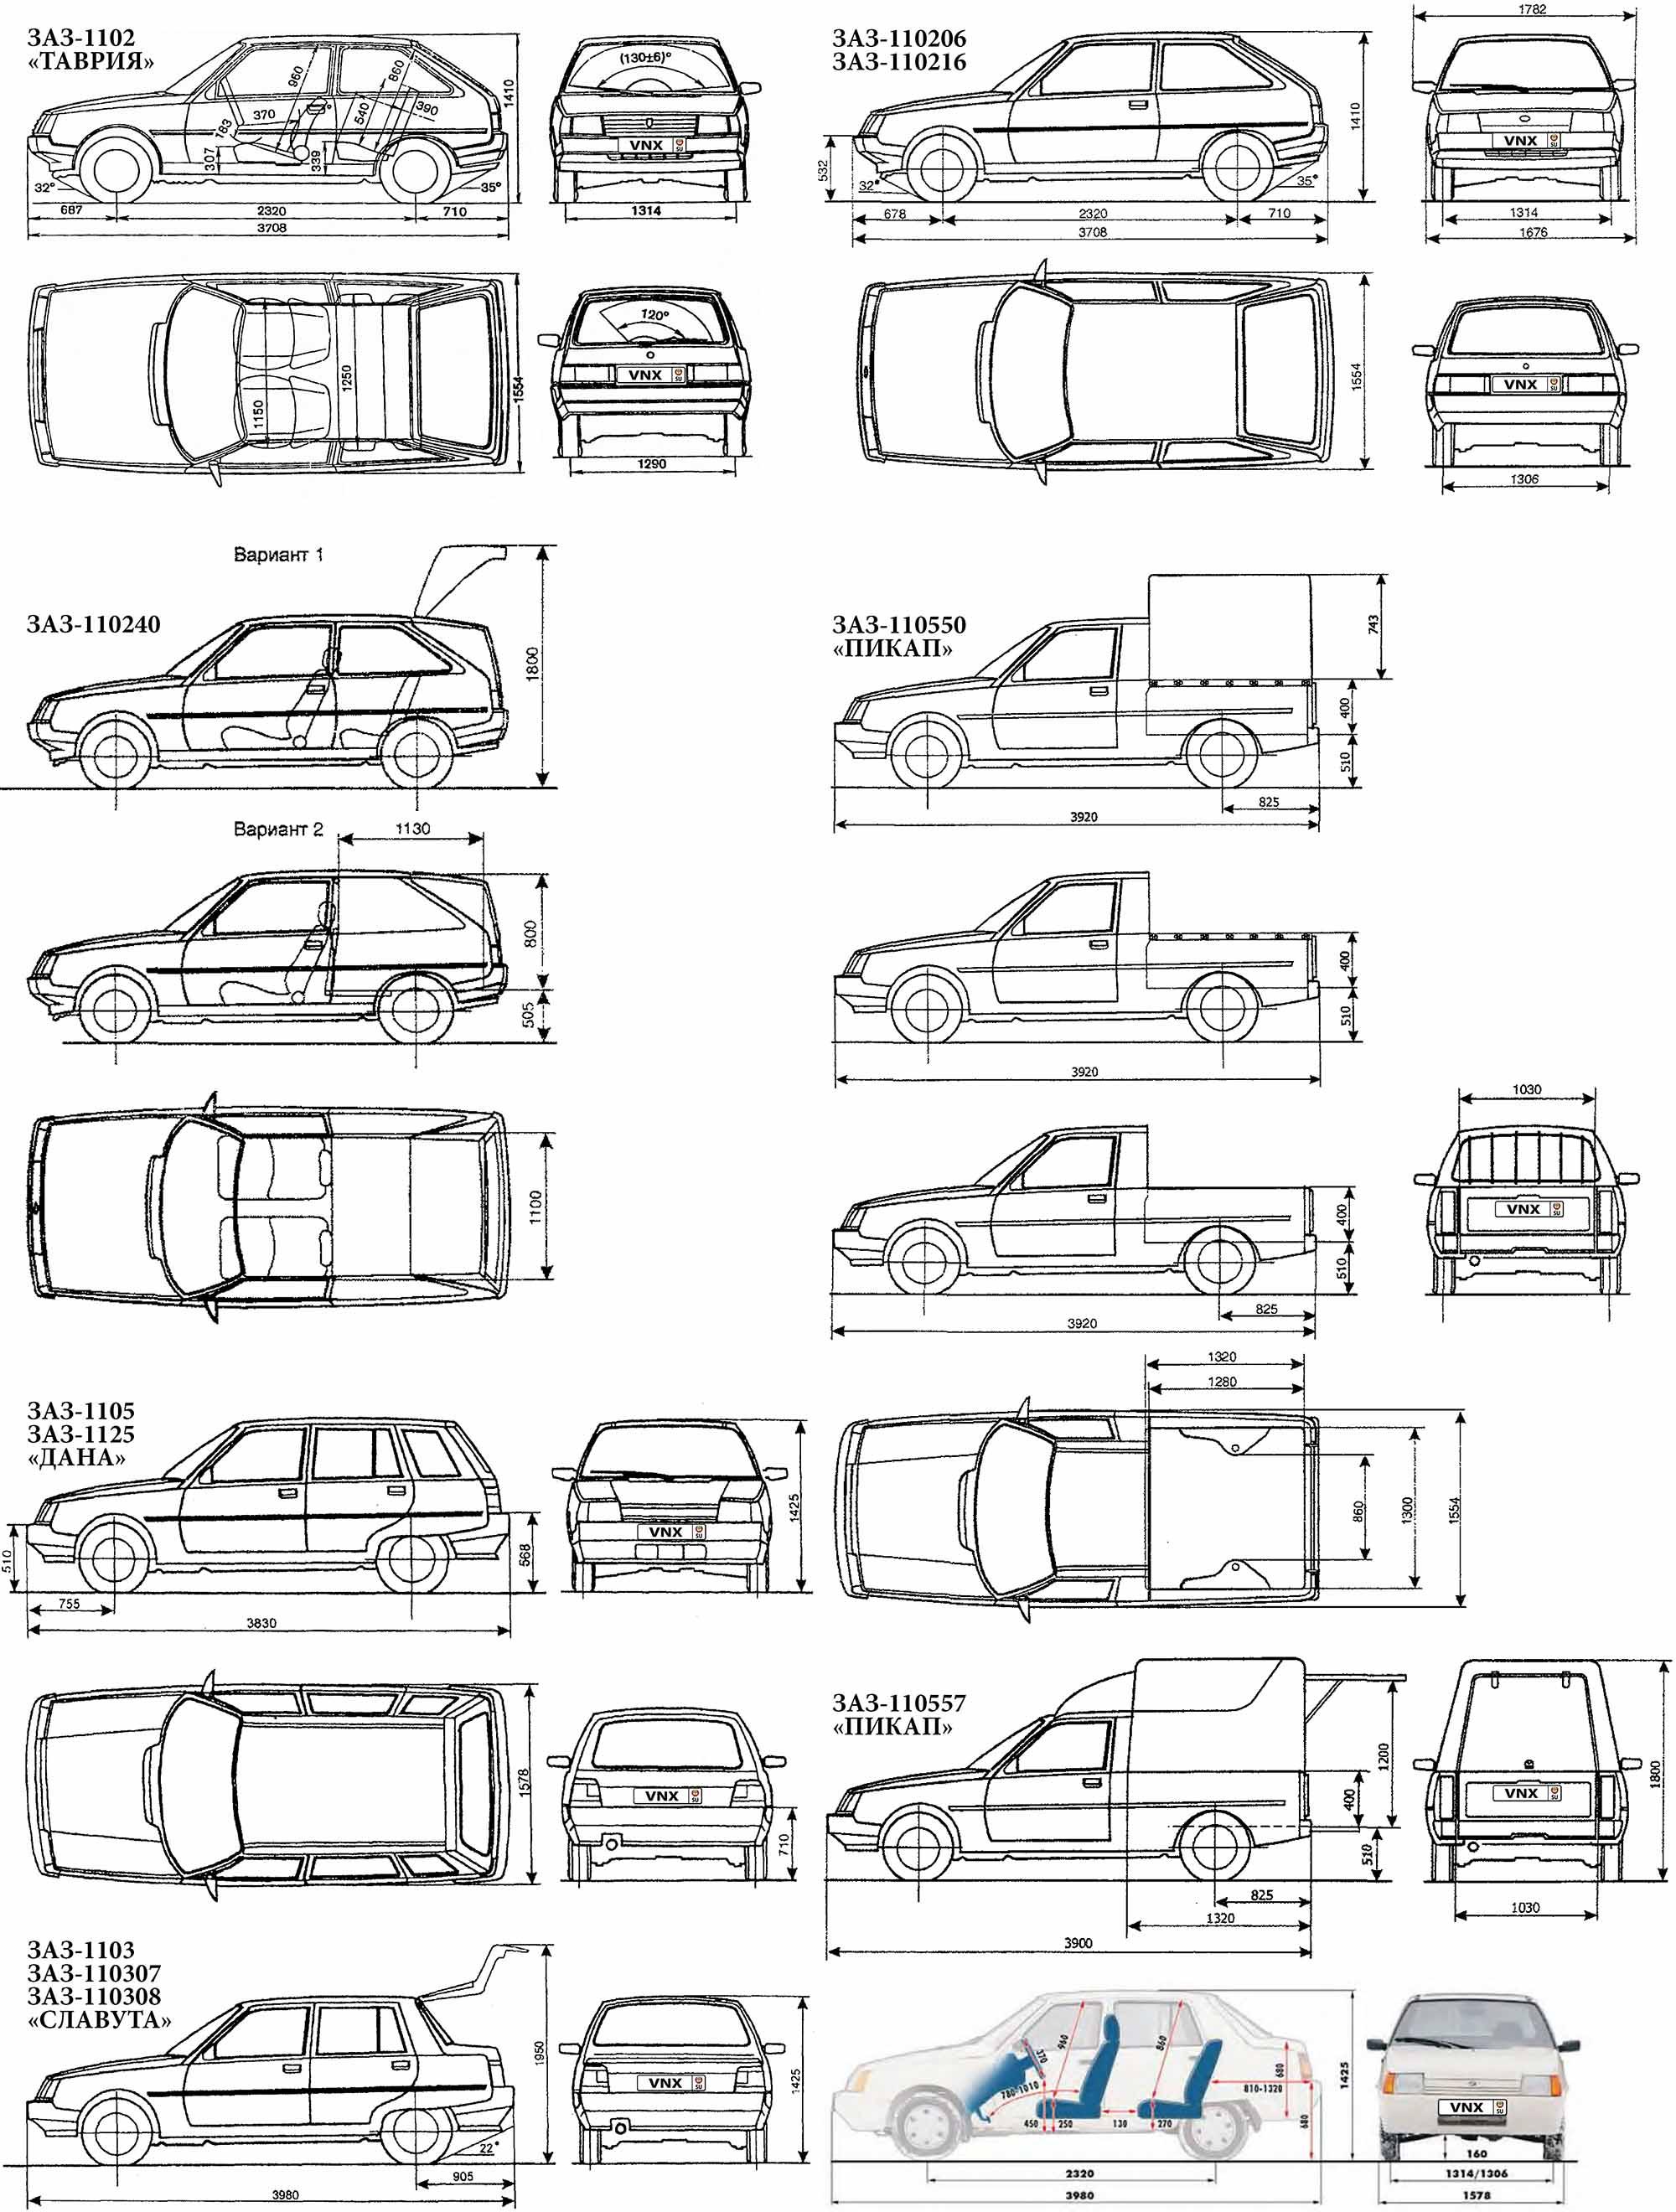 Габаритные размеры ЗАЗ-1102, ЗАЗ-1103, ЗАЗ-1105 и их модификации Таврия, Славута, Дана, Пикап (dimensions ZAZ Tavria, Slavuta, Dana, Pick-Up 1987-2011)